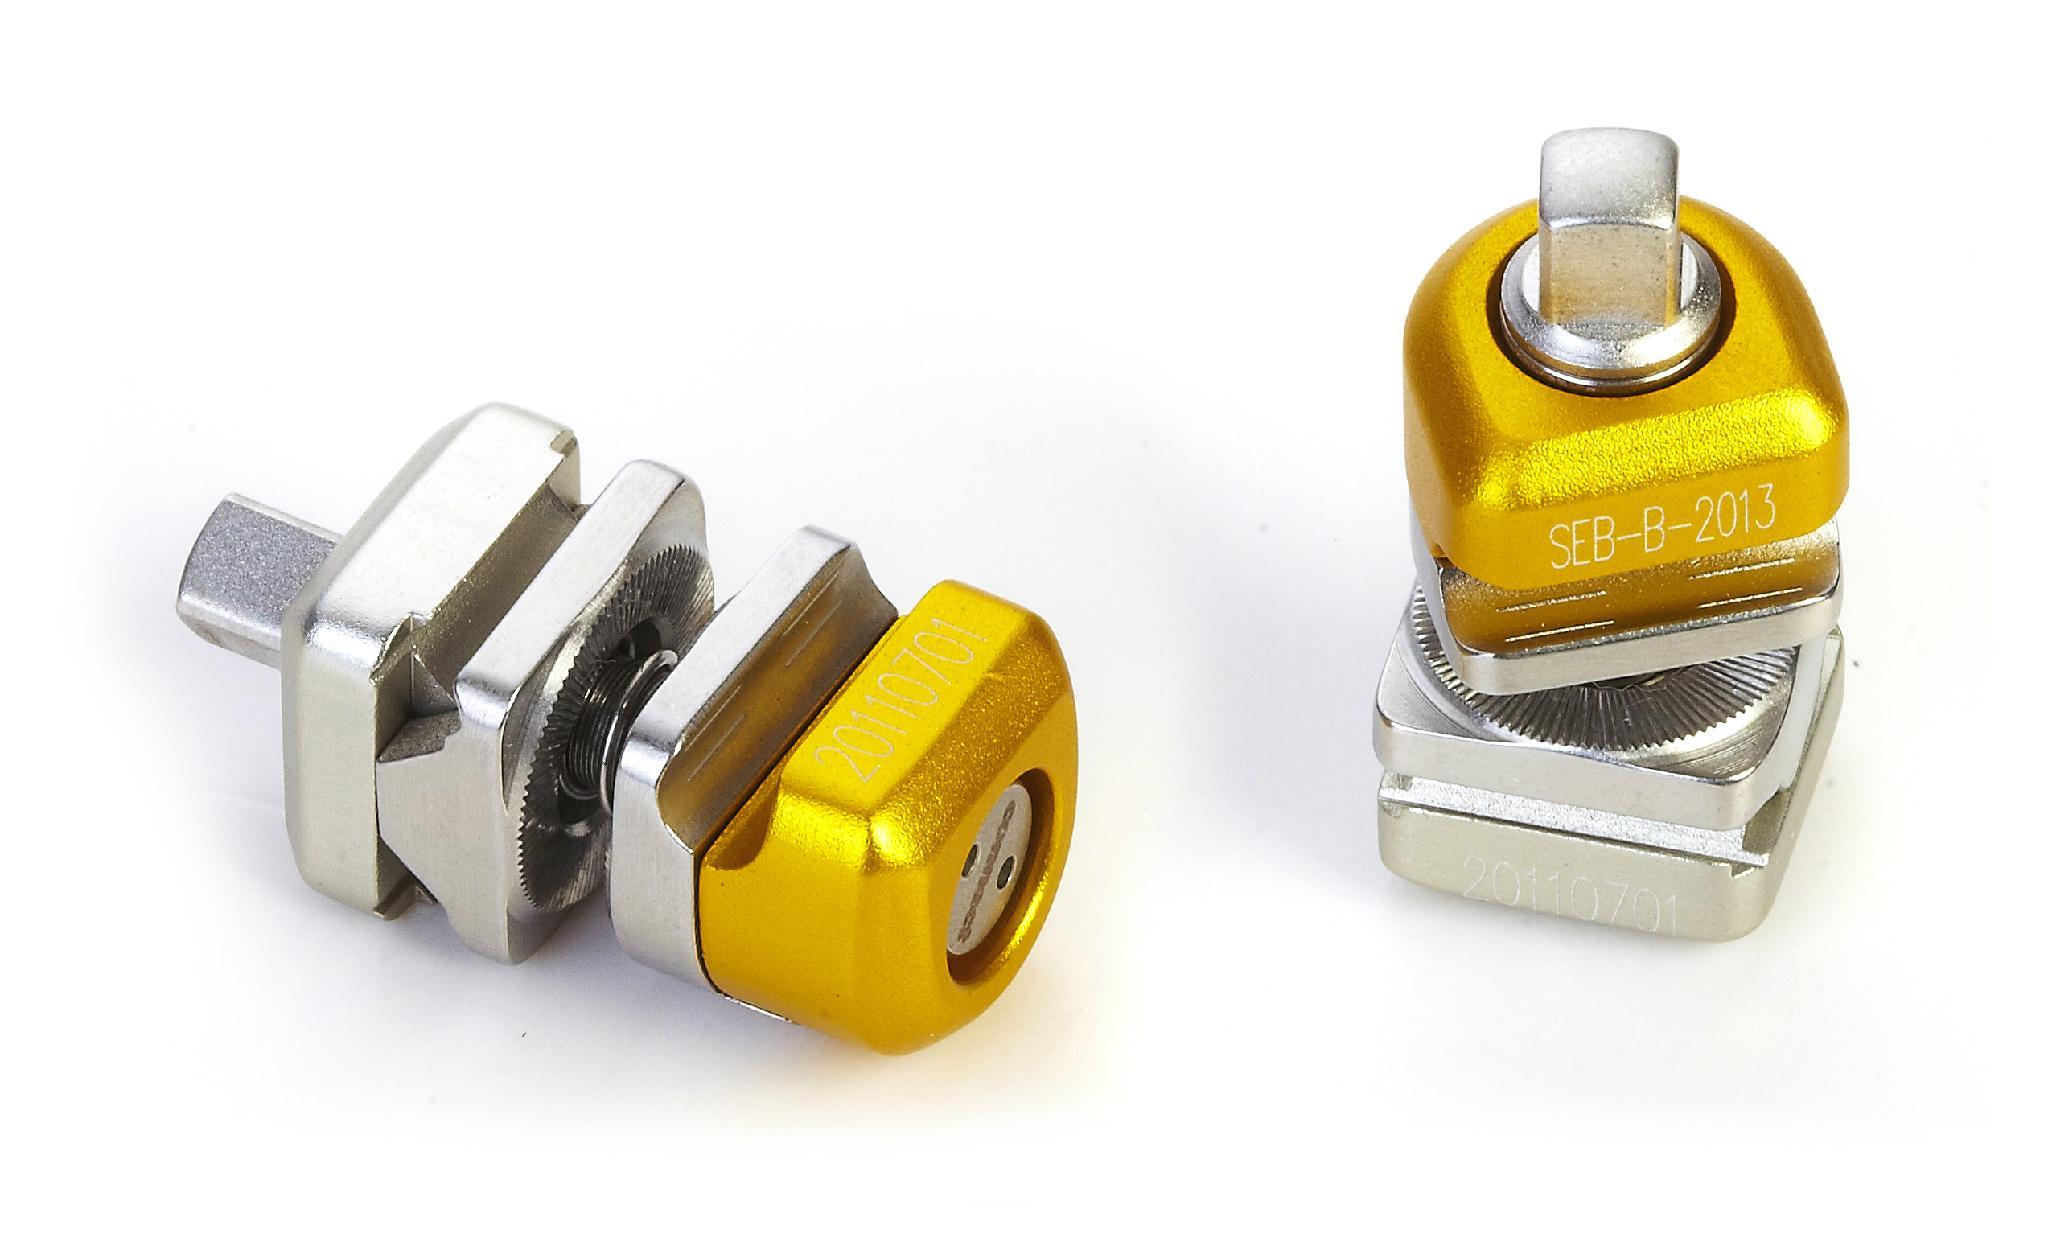 SK Combined External Fixator(Small Bone) 14